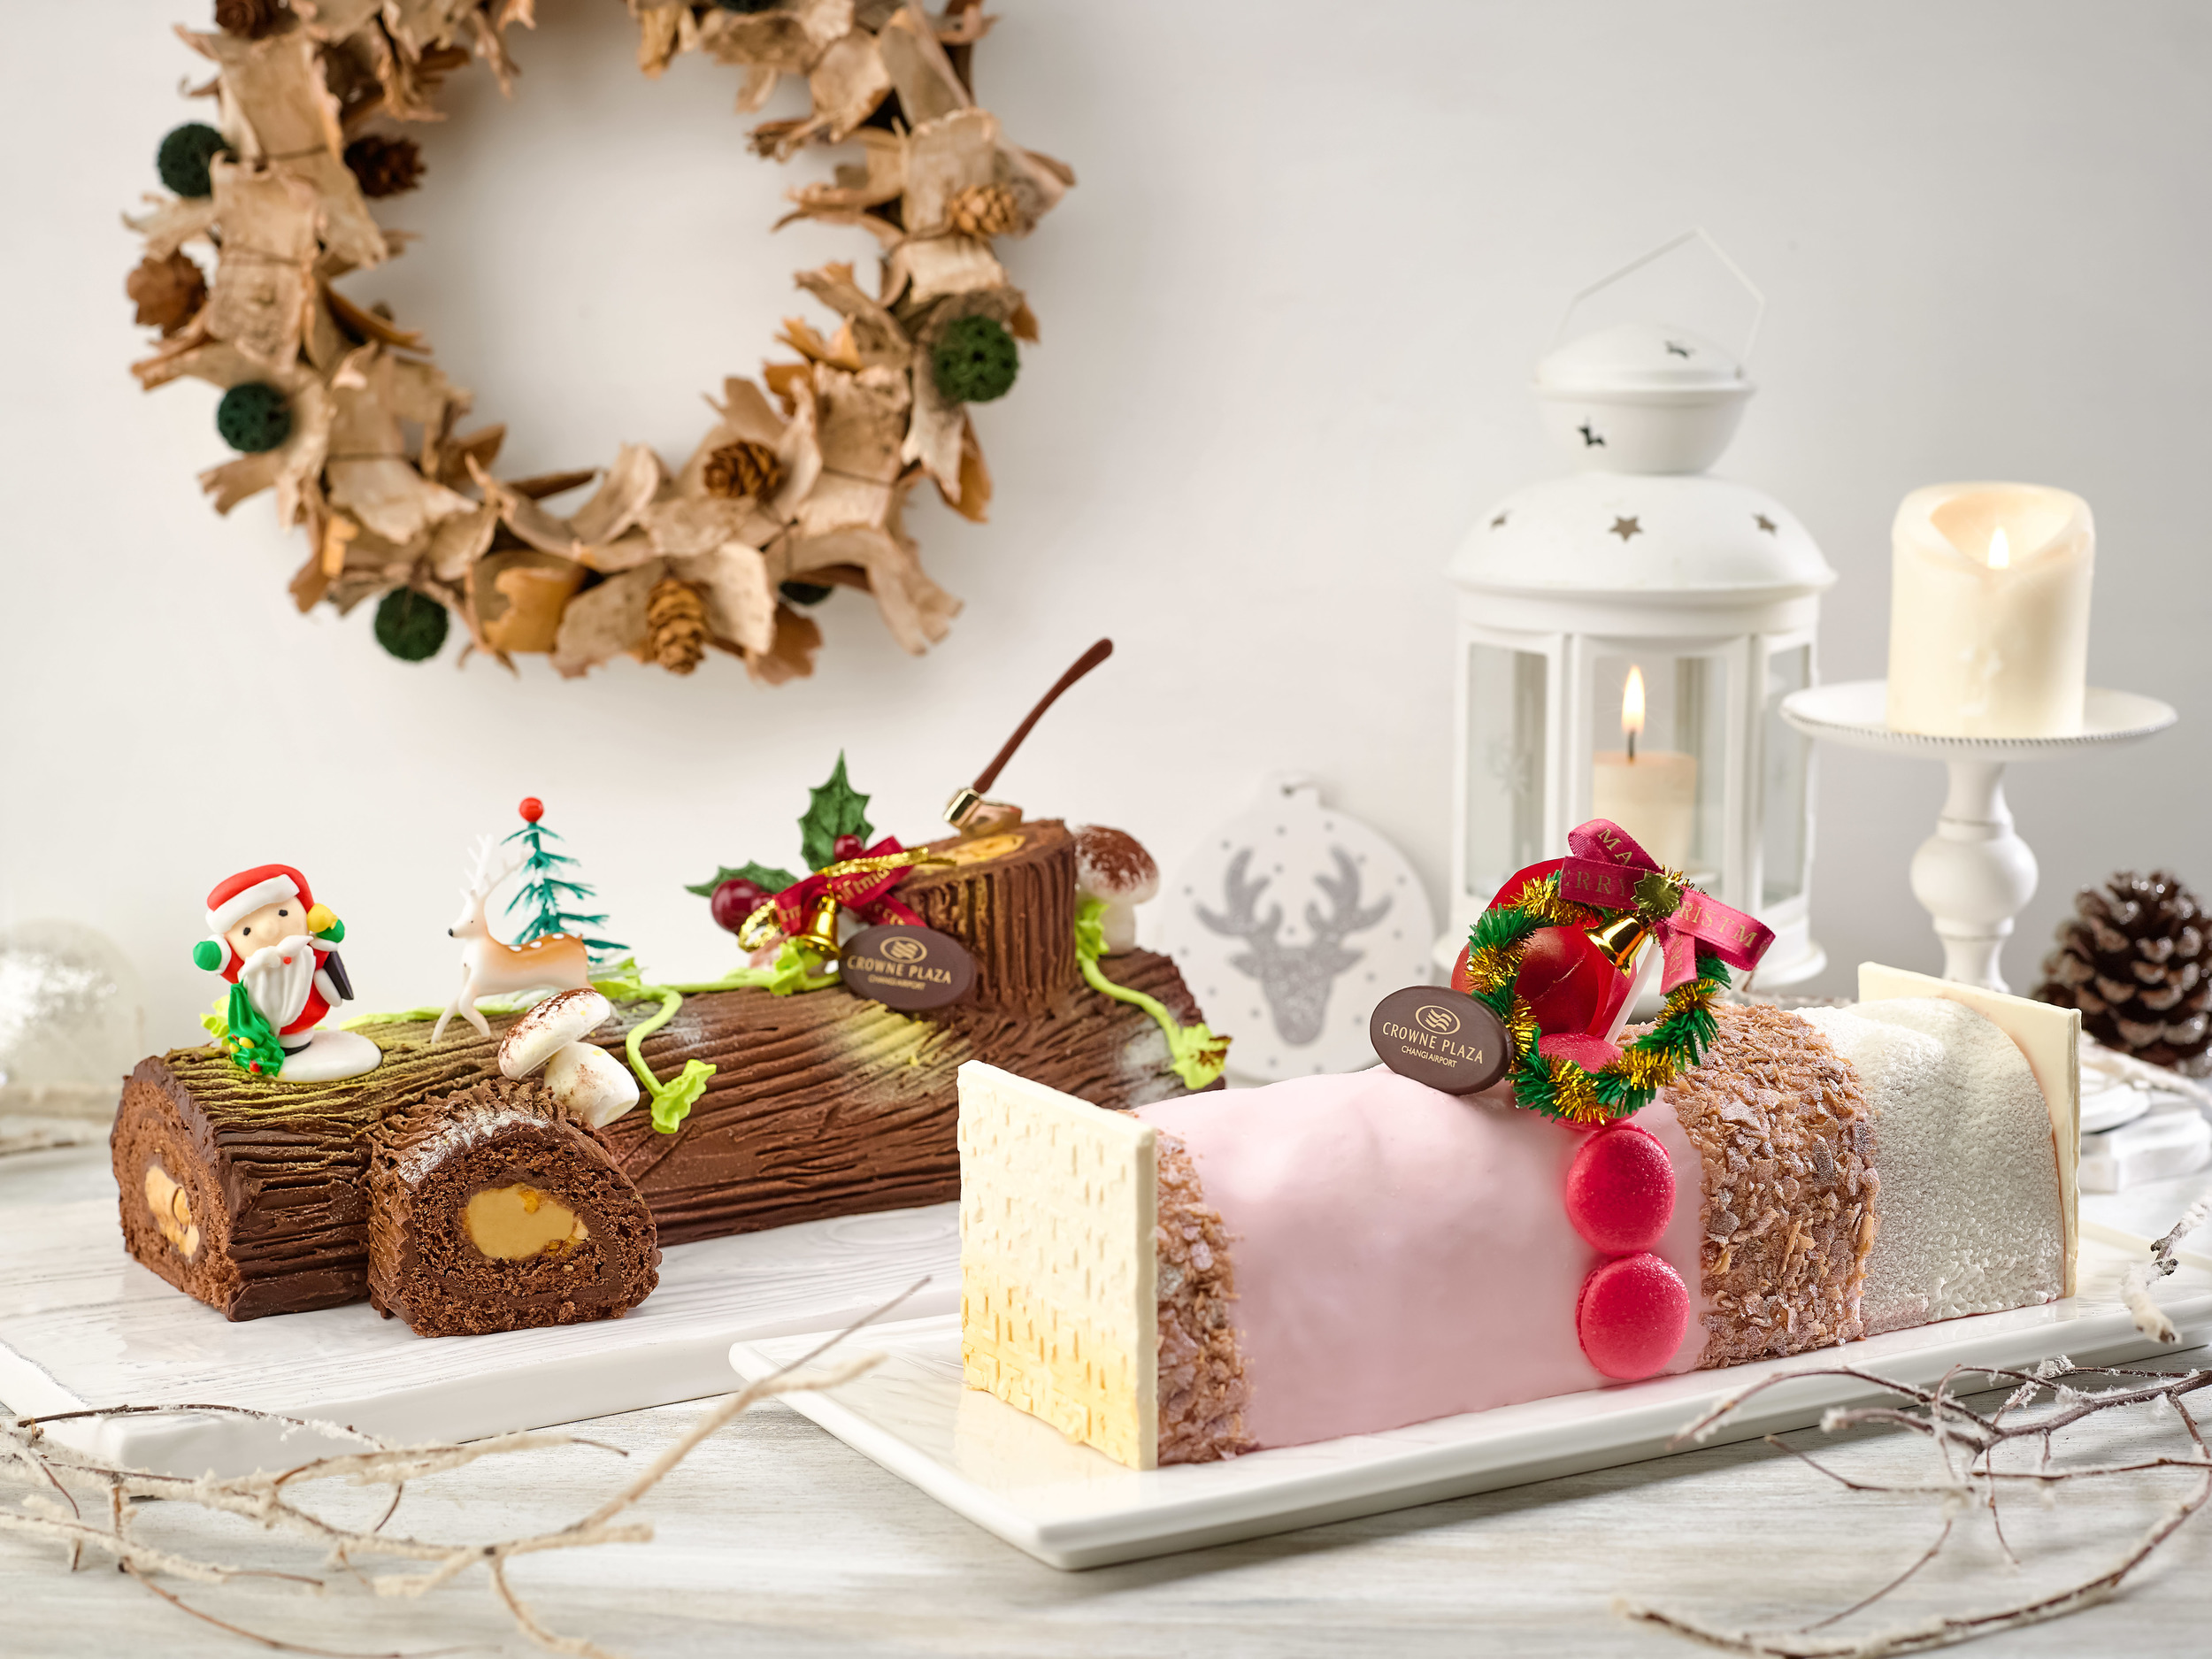 Festive Log Cakes | Photo Credit: Crowne Plaza Changi Airport